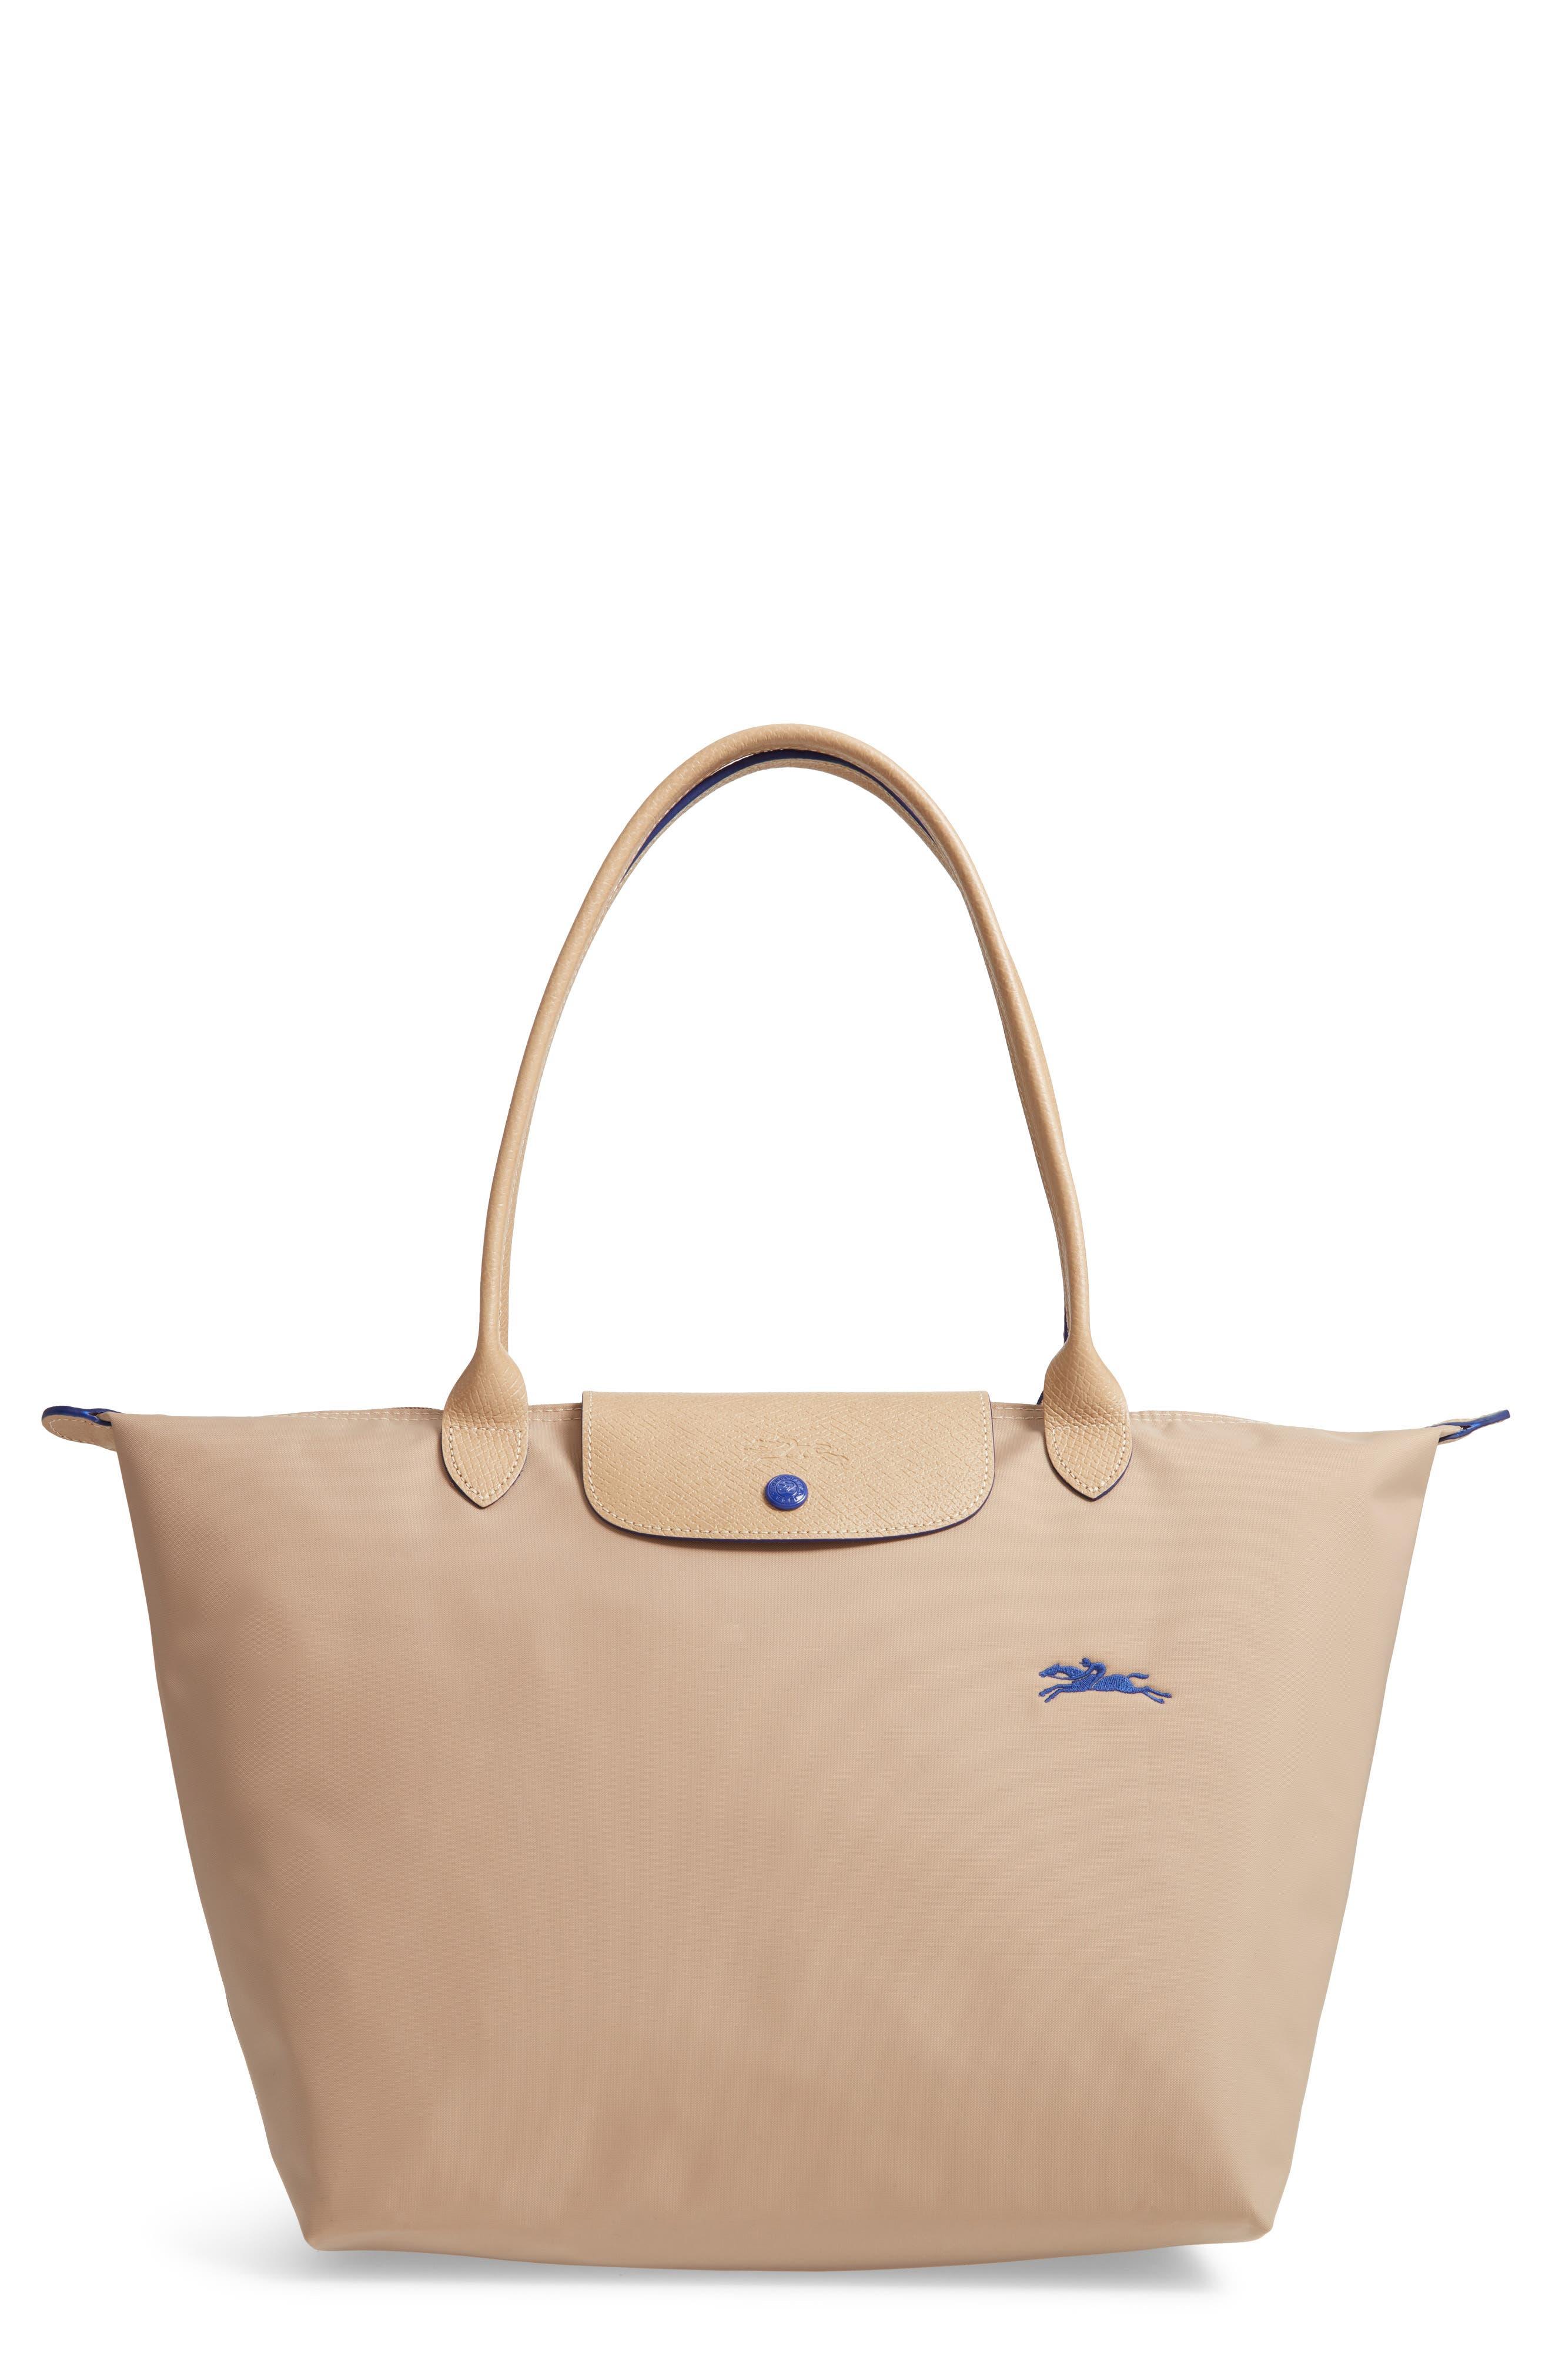 Image of LONGCHAMP Large Canvas Club Shoulder Tote Bag